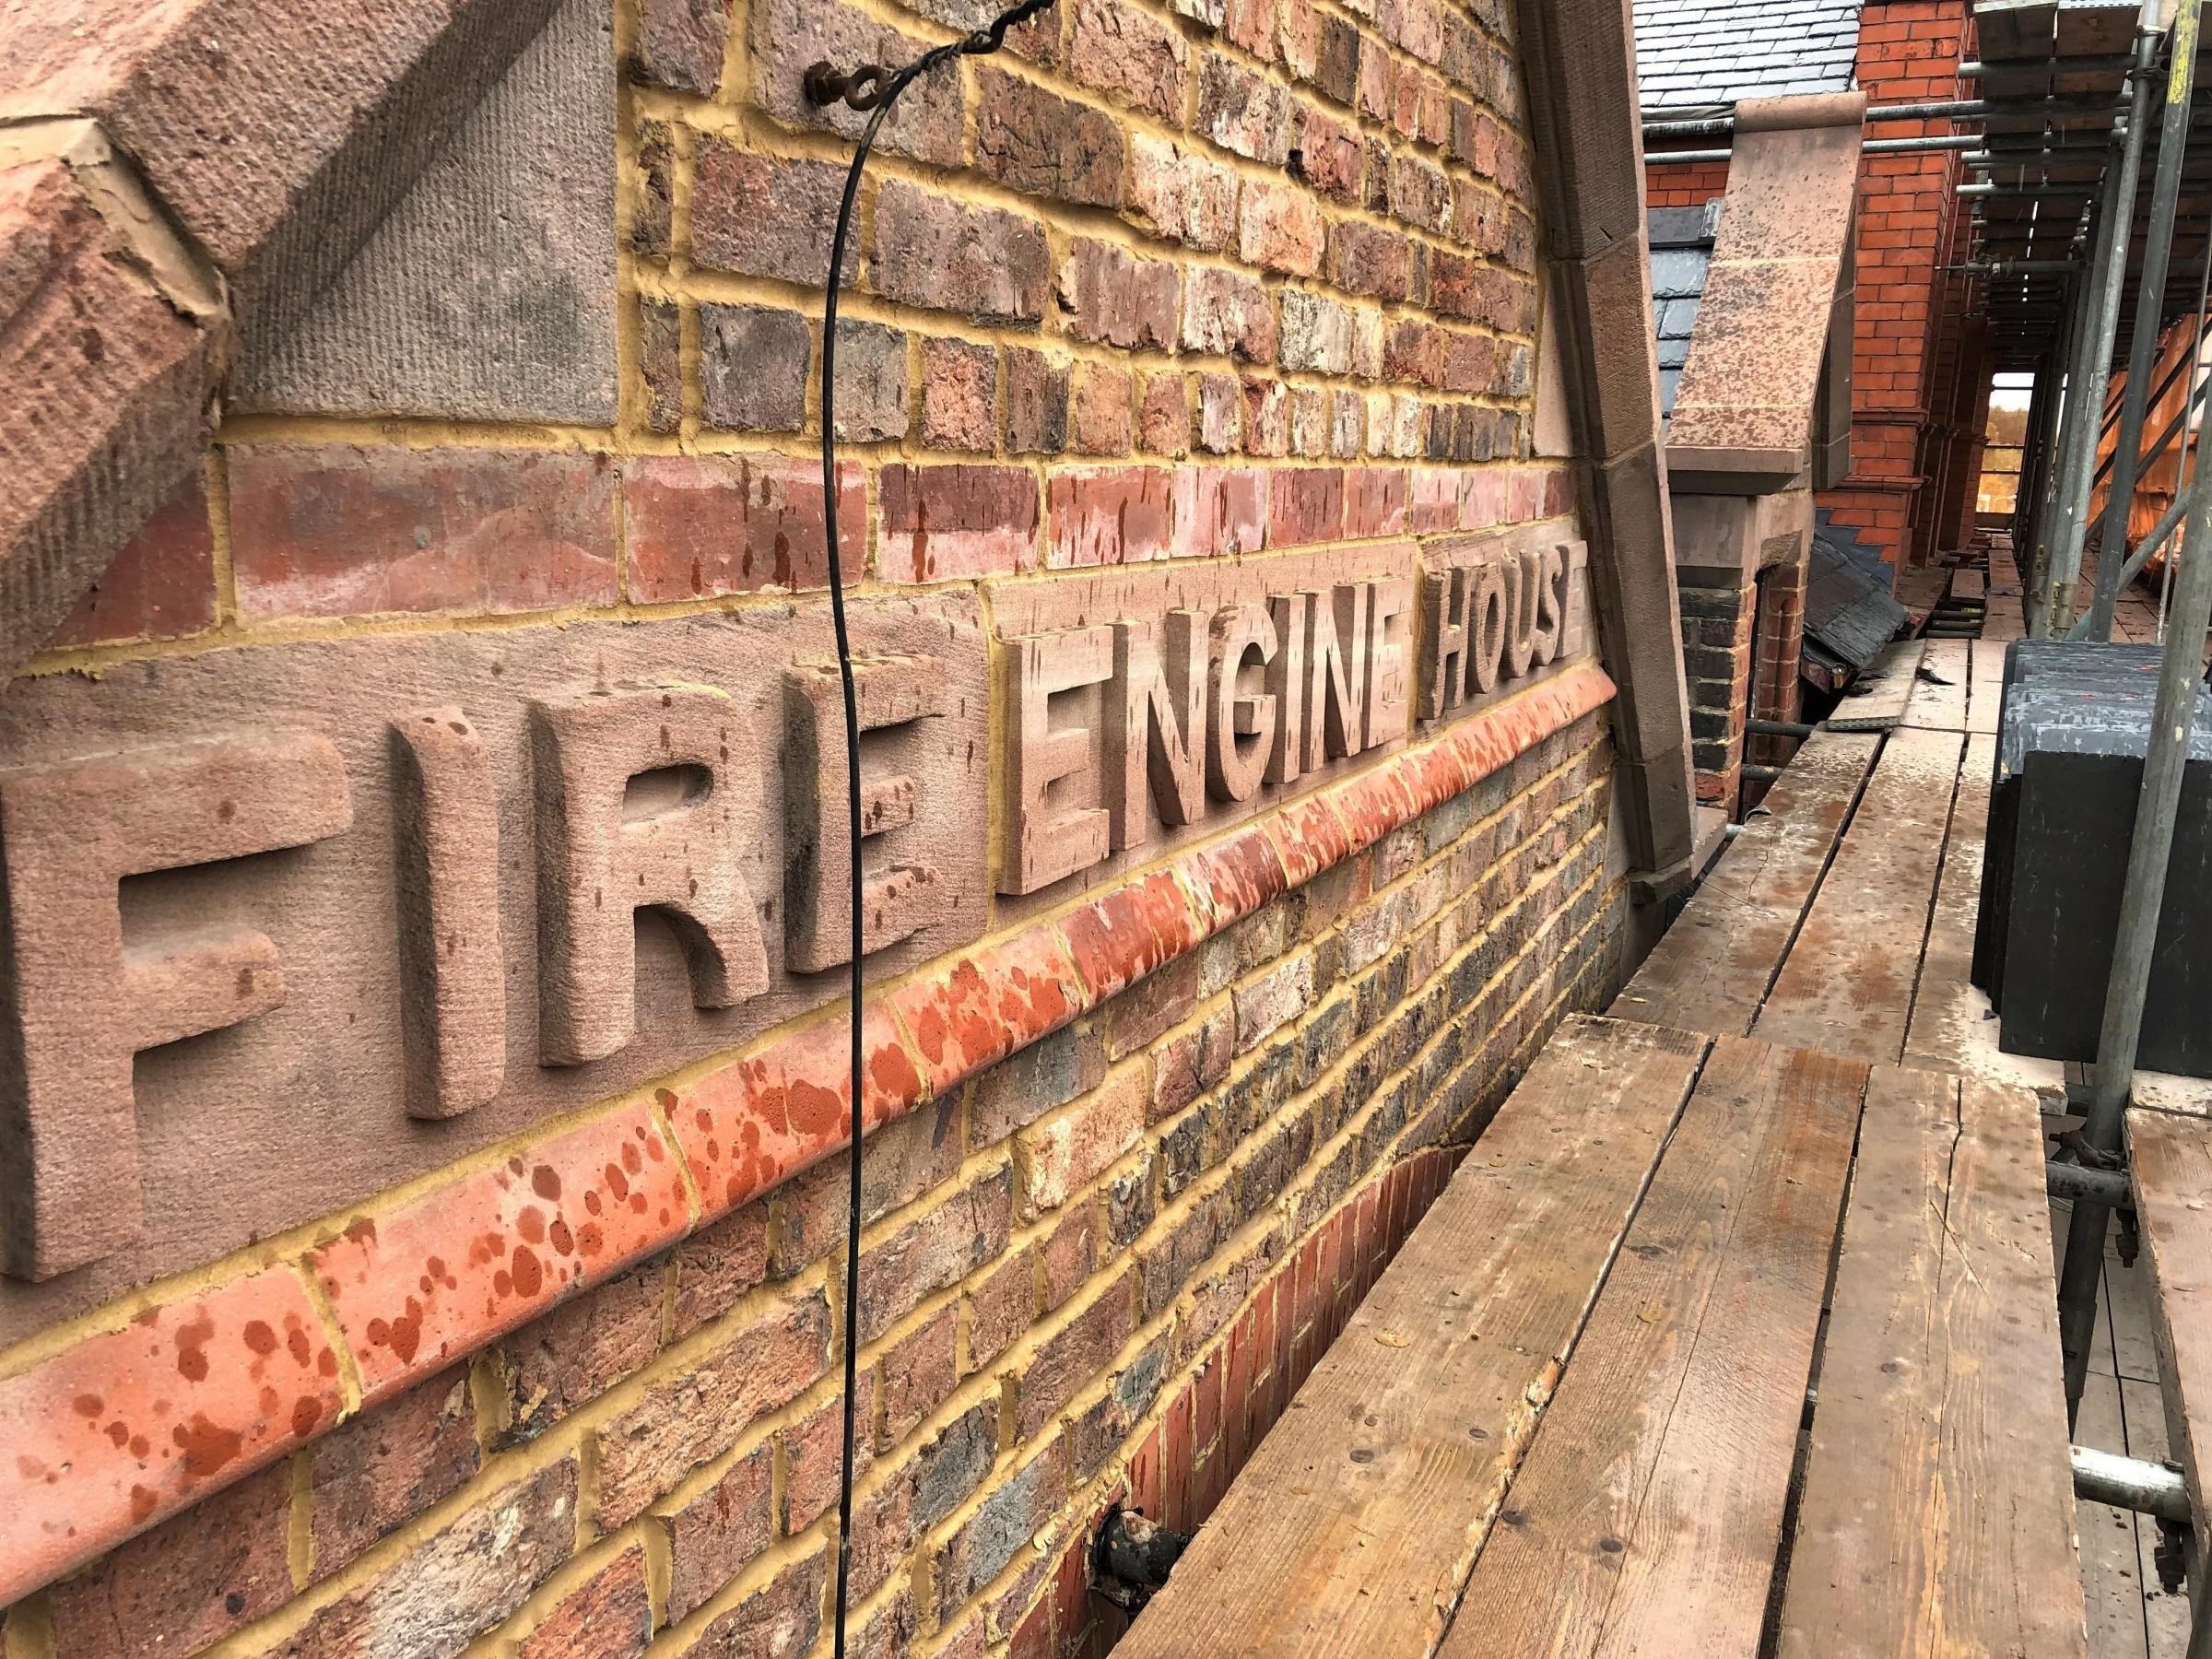 Watch: Building renovation reveals Victorian origins